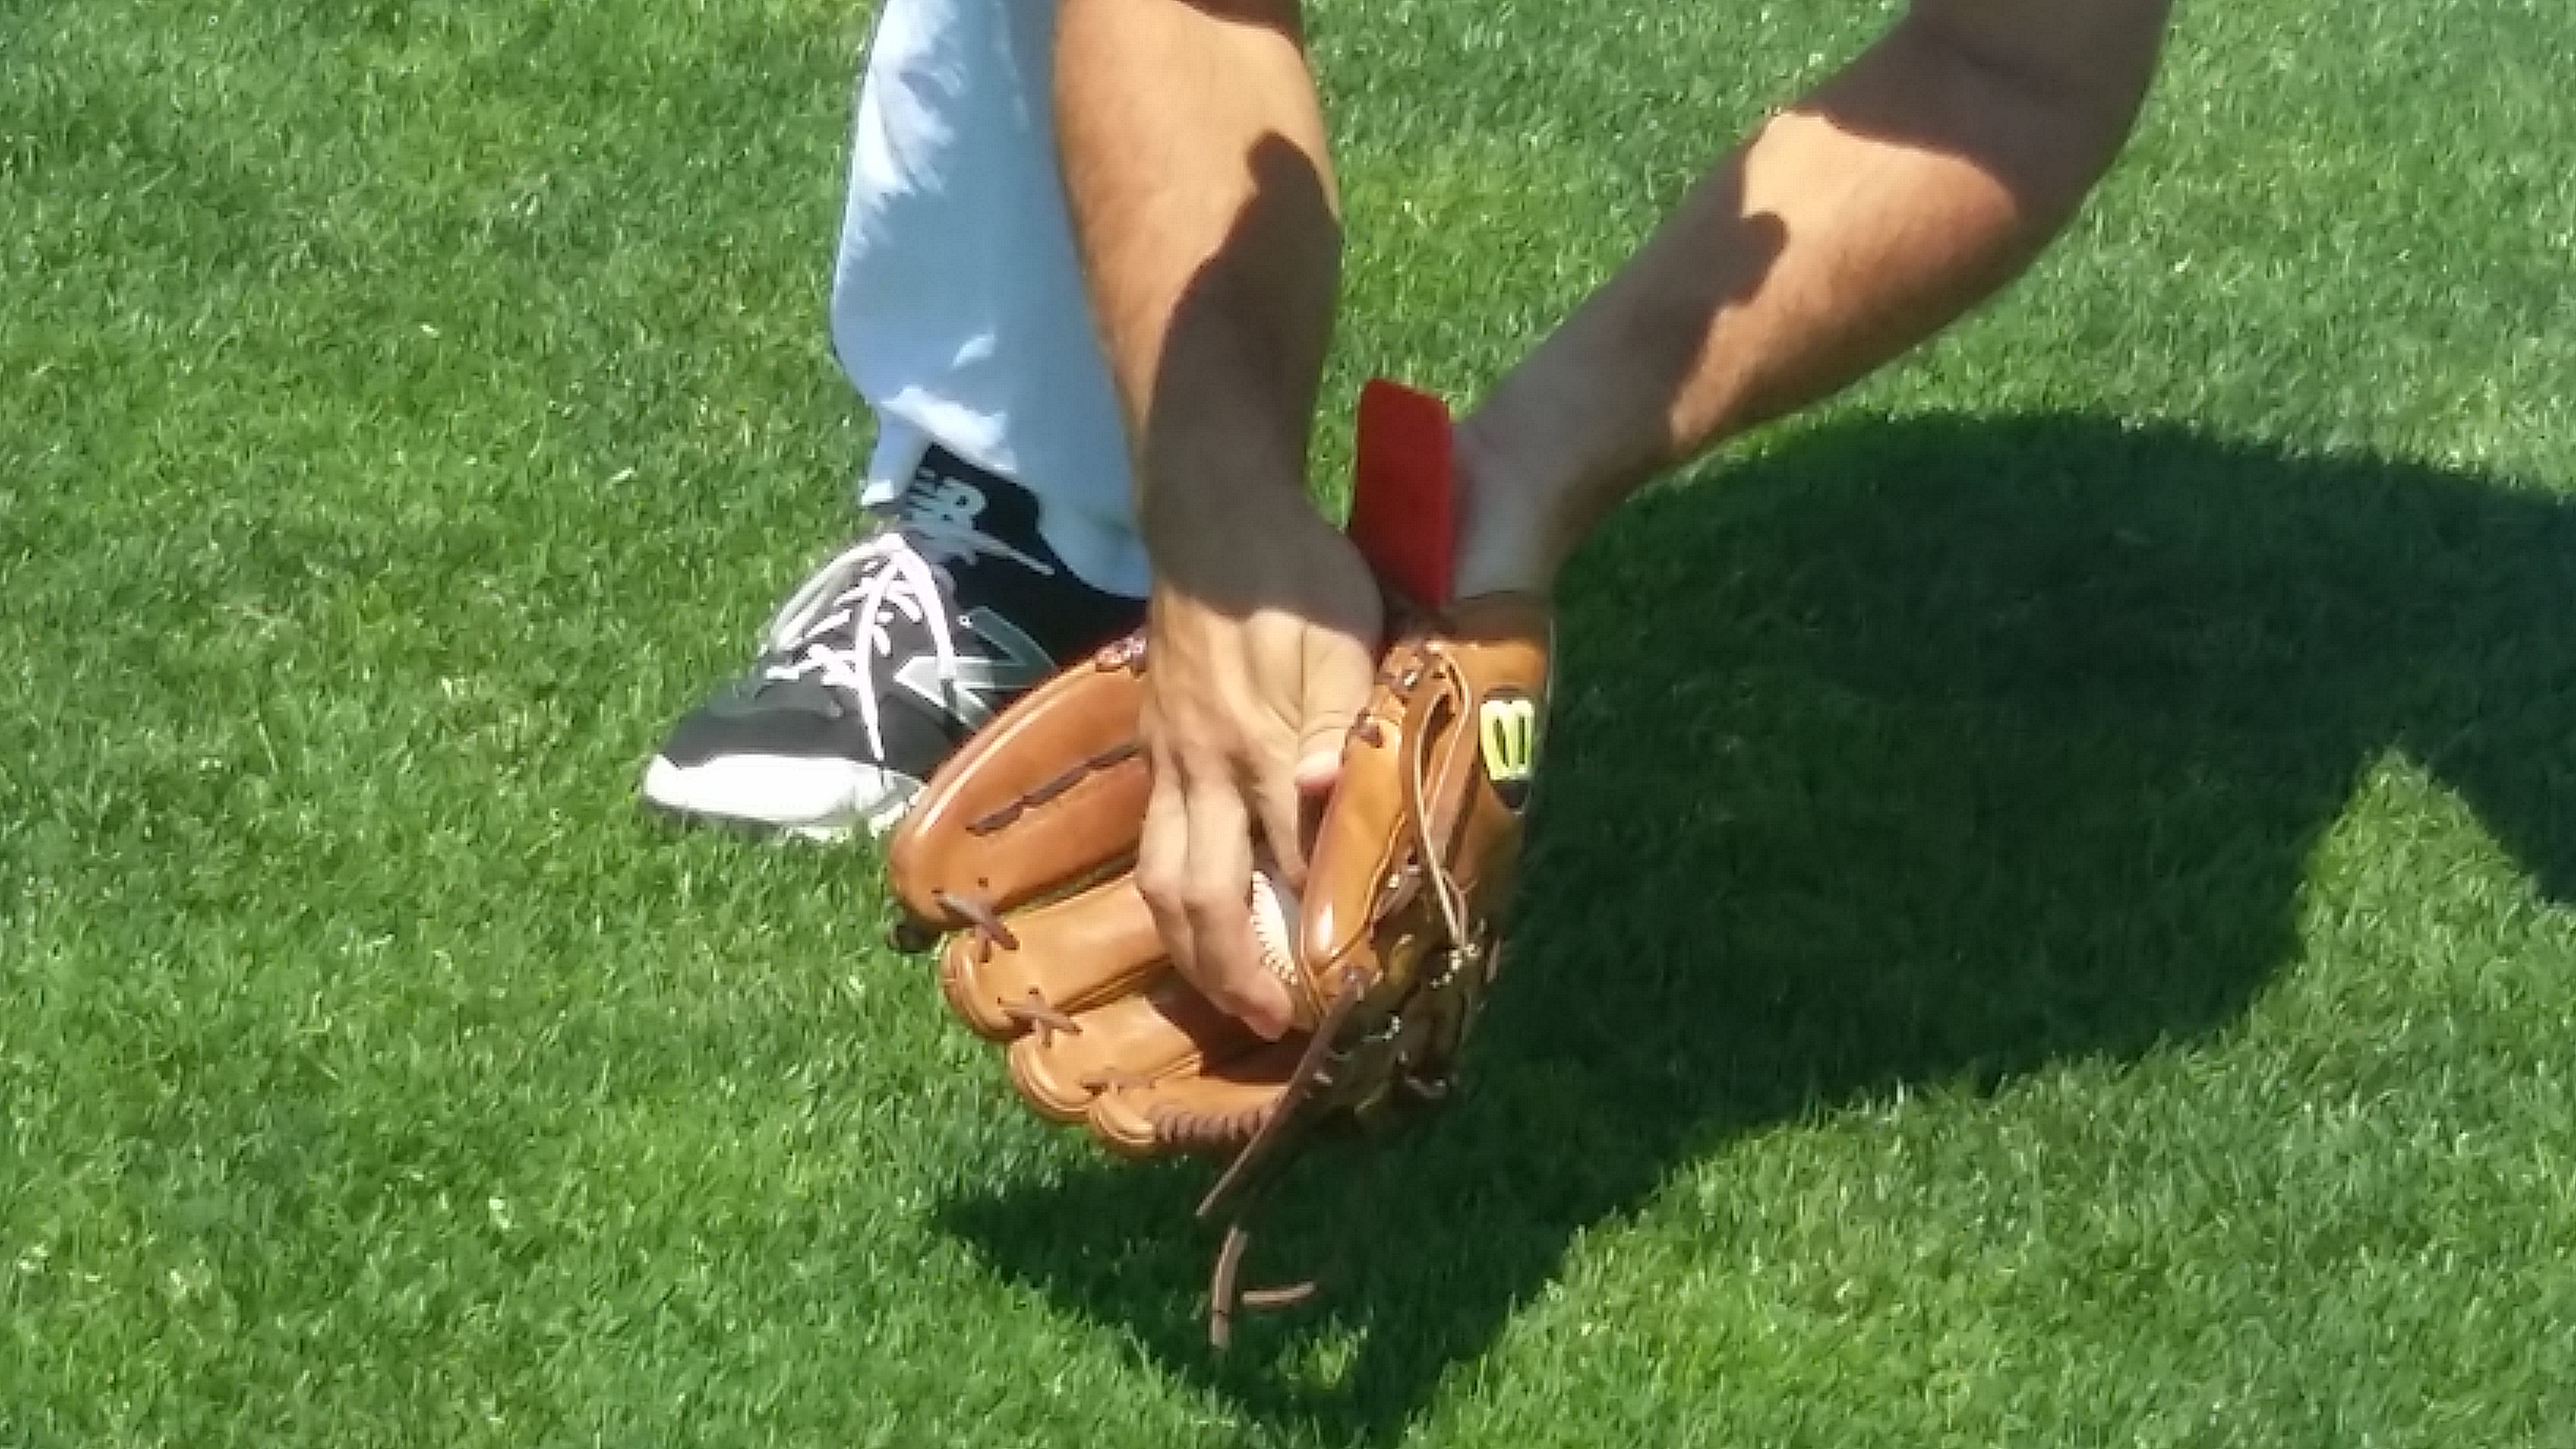 twohandspro-professionall-baseball.jpg